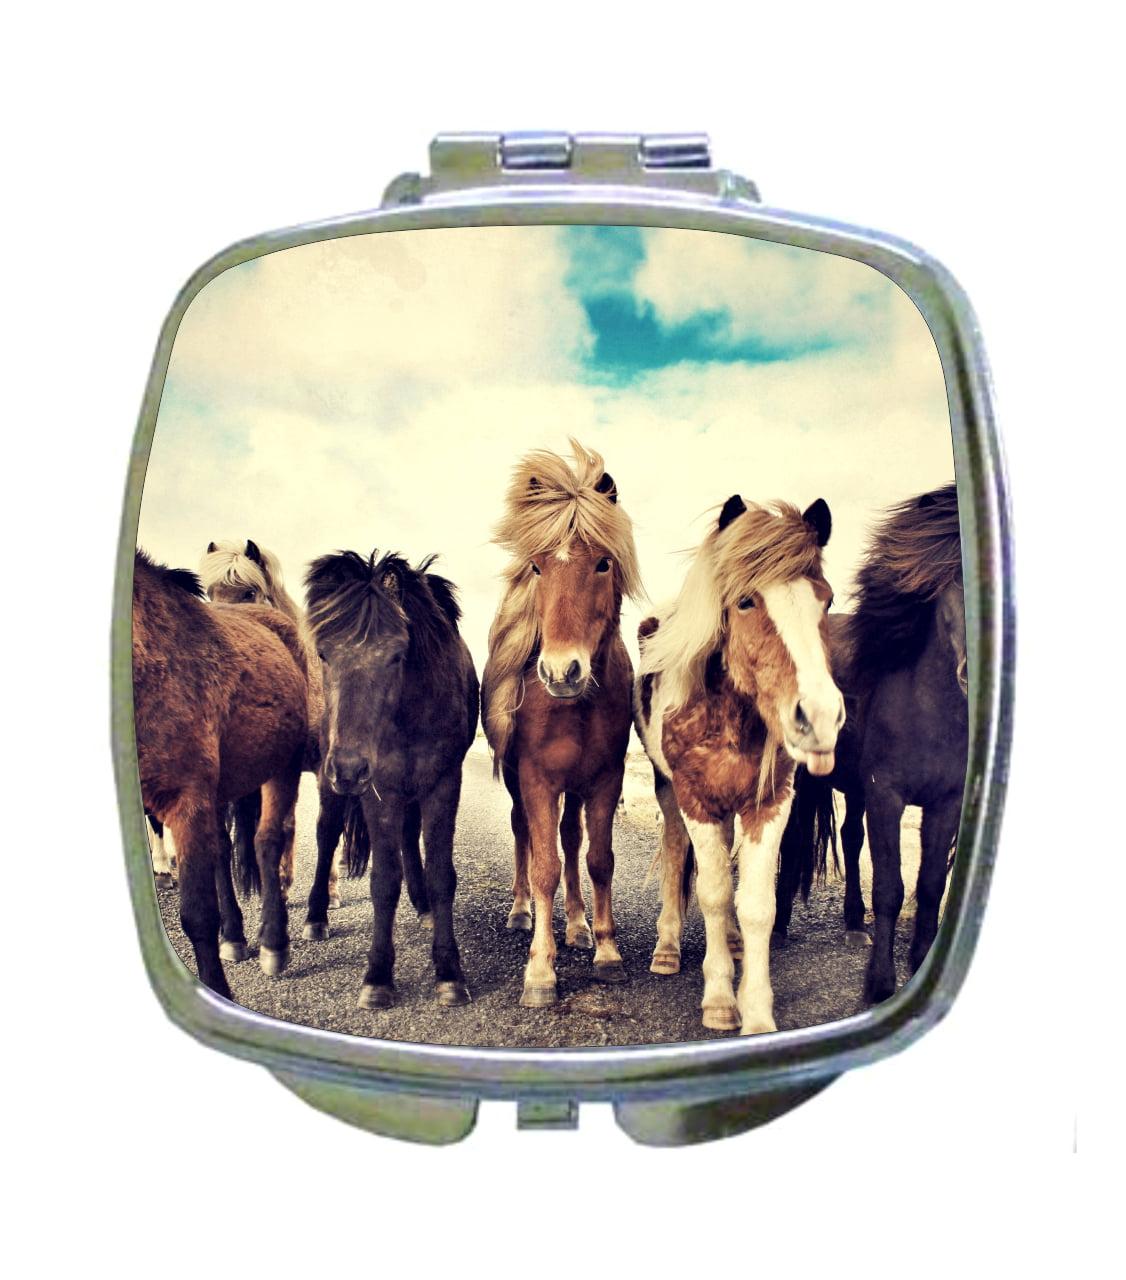 Horse Trail Animal Wildlife Horses Nature Design Compact Square Face Makeup Mirror Walmart Com Walmart Com